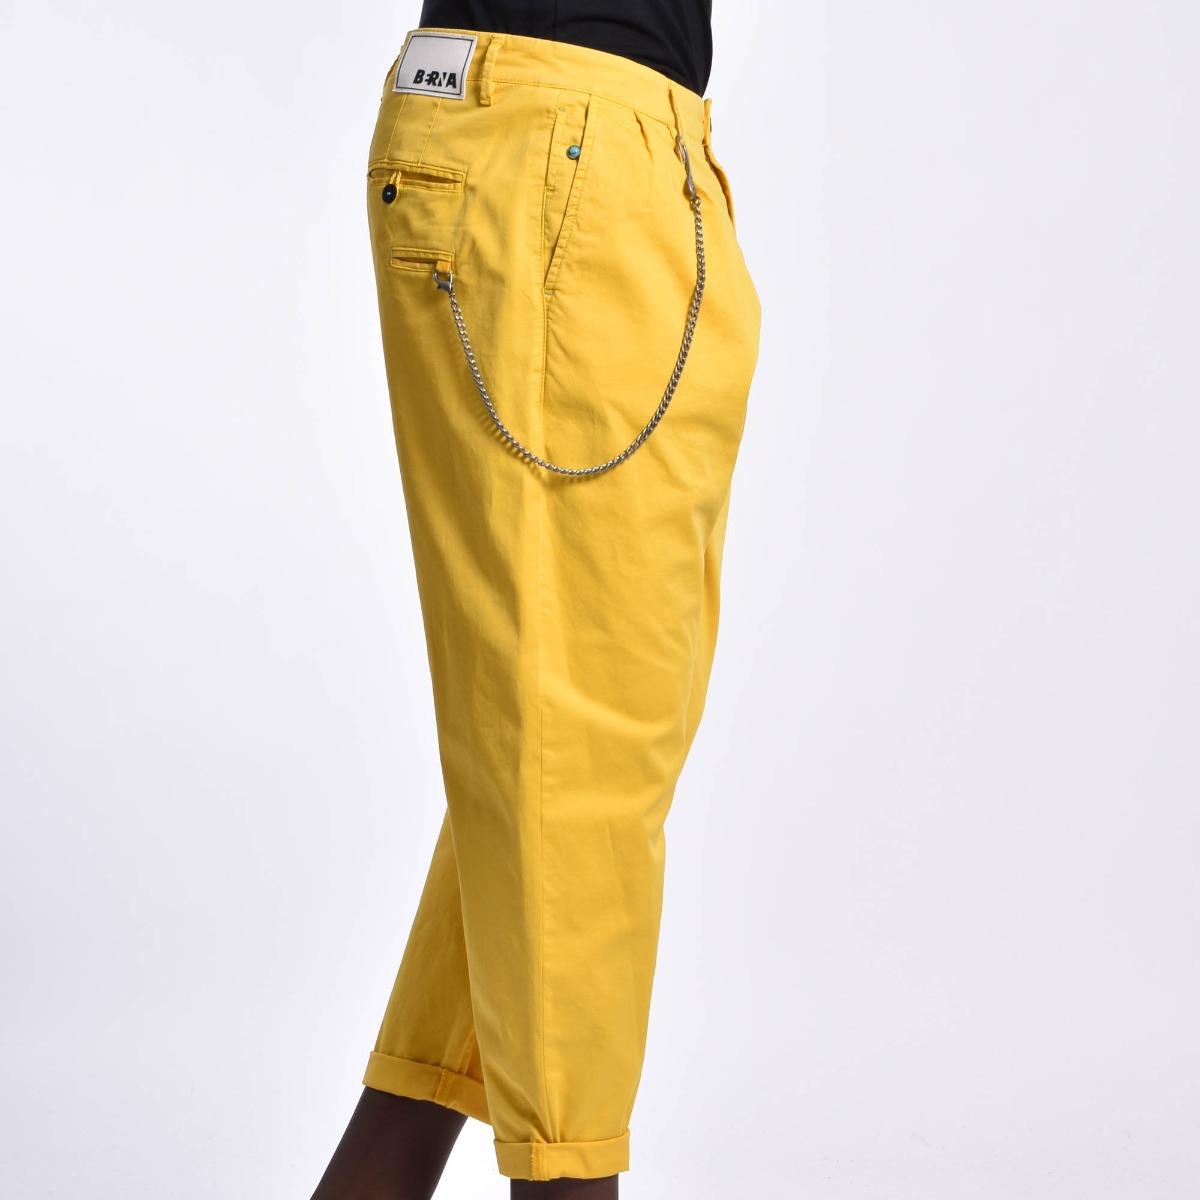 Pantalone tasca america catena - Giallo